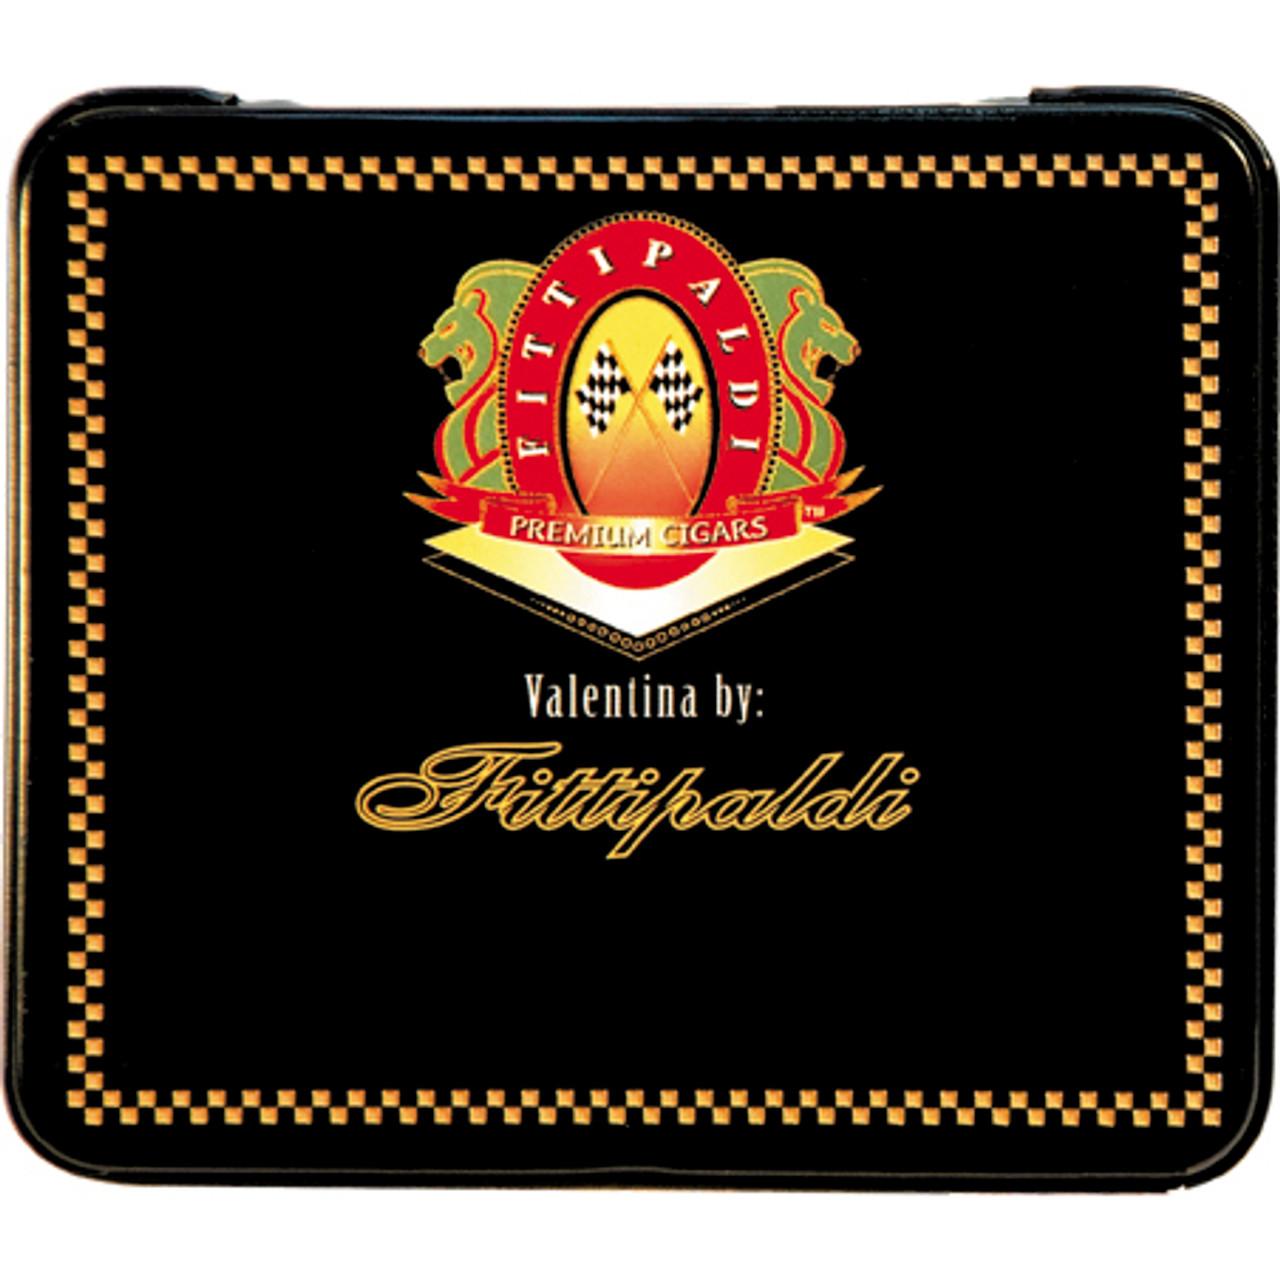 Fittipaldi Valentina Cinnamon Cigars - 3 3/8 x 22 (5 Tins of 13)